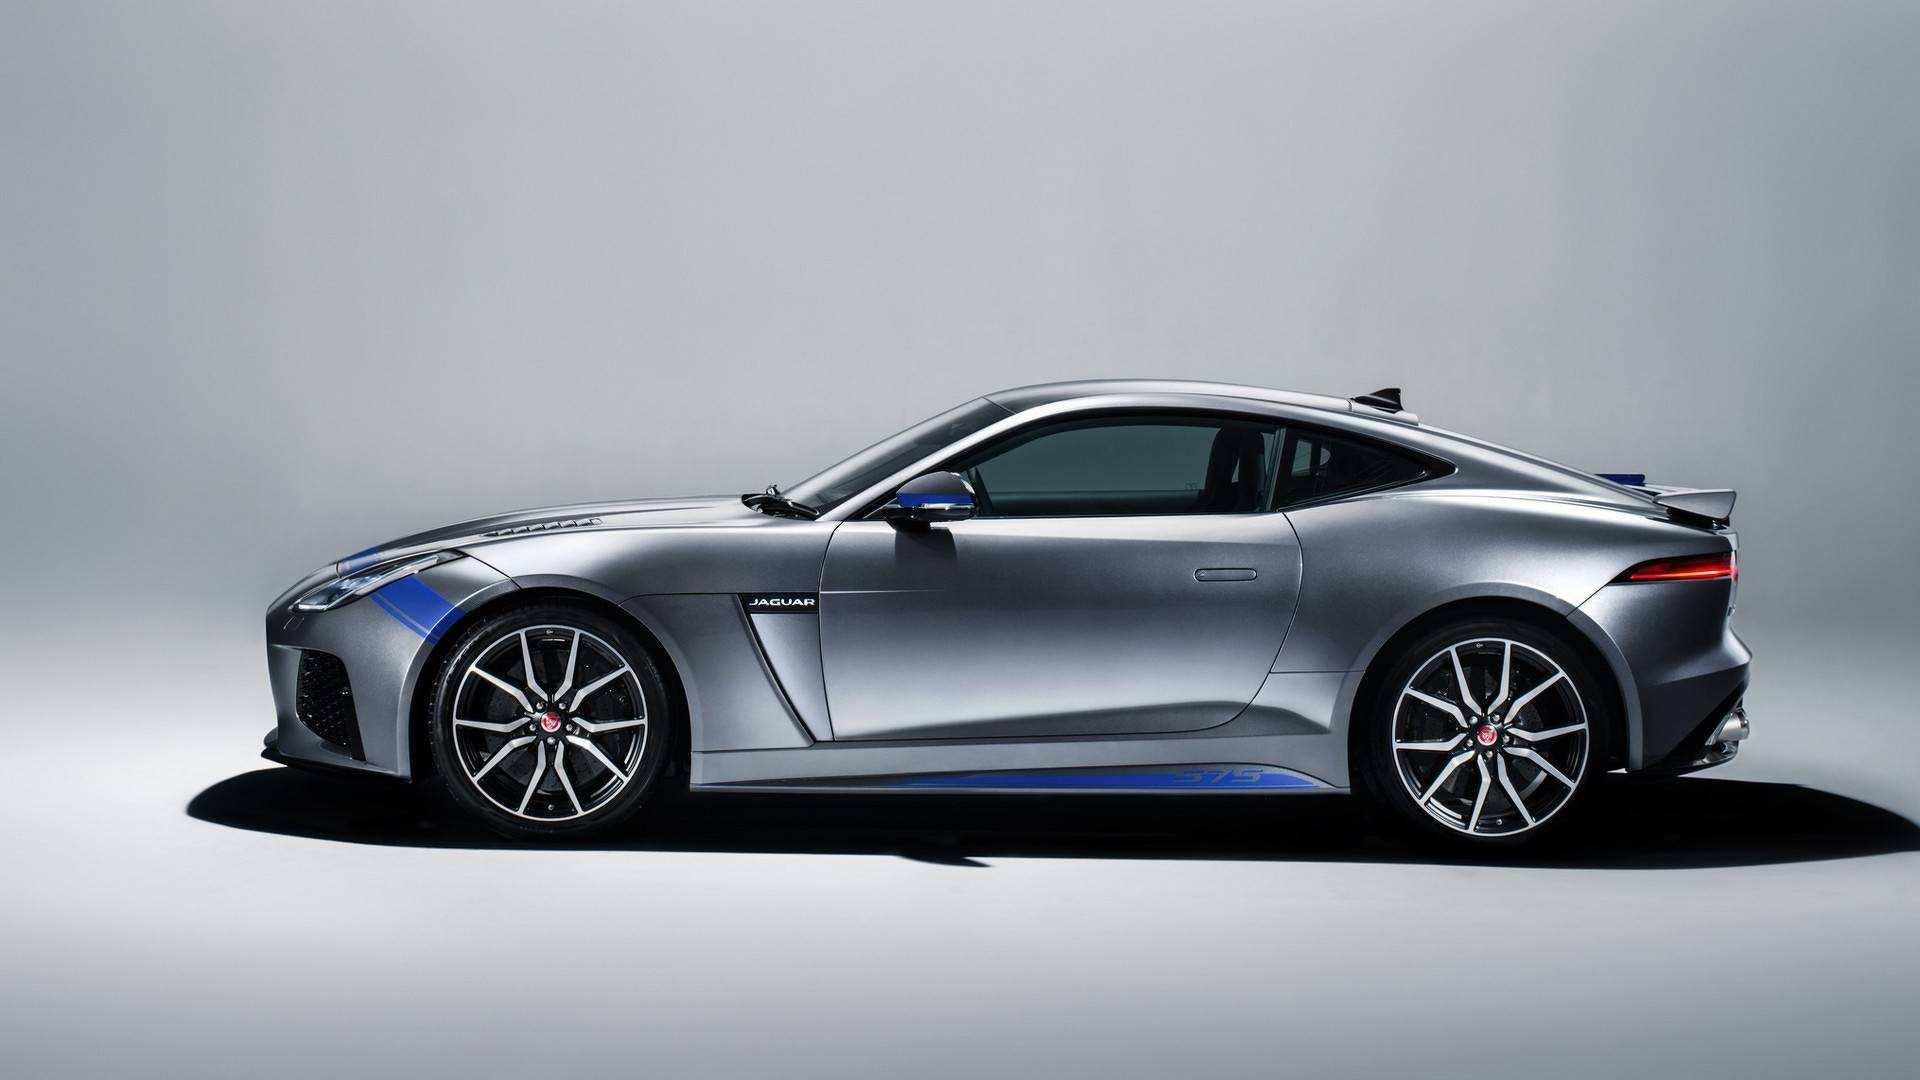 72 All New 2020 Jaguar F Type Convertible Configurations with 2020 Jaguar F Type Convertible